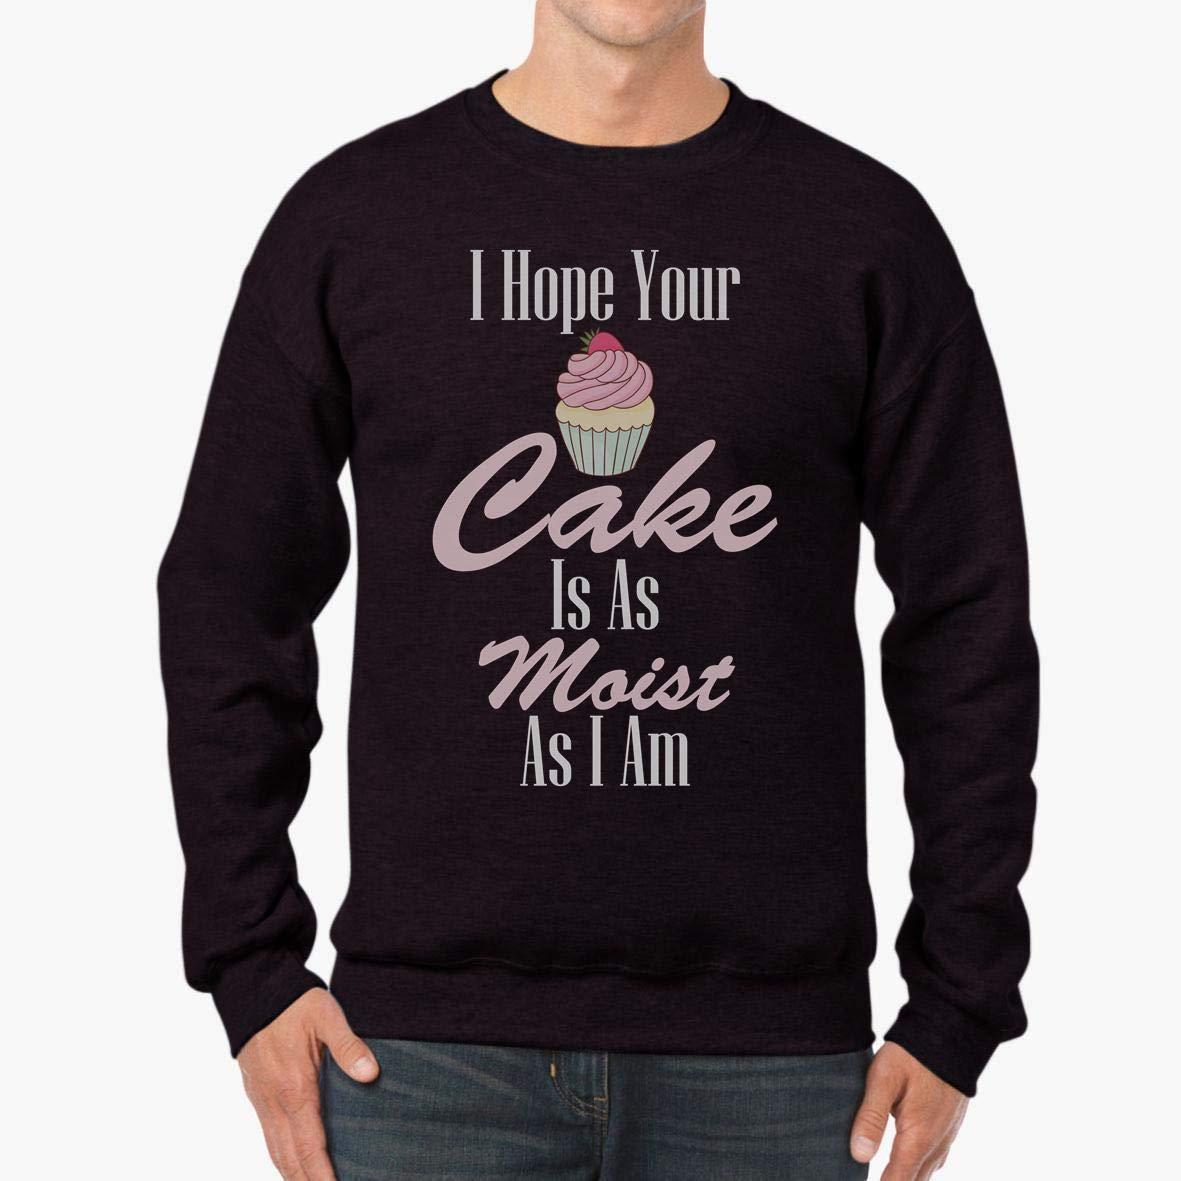 I Hope Your Cake is As Moist As I Am Funny Unisex Sweatshirt tee